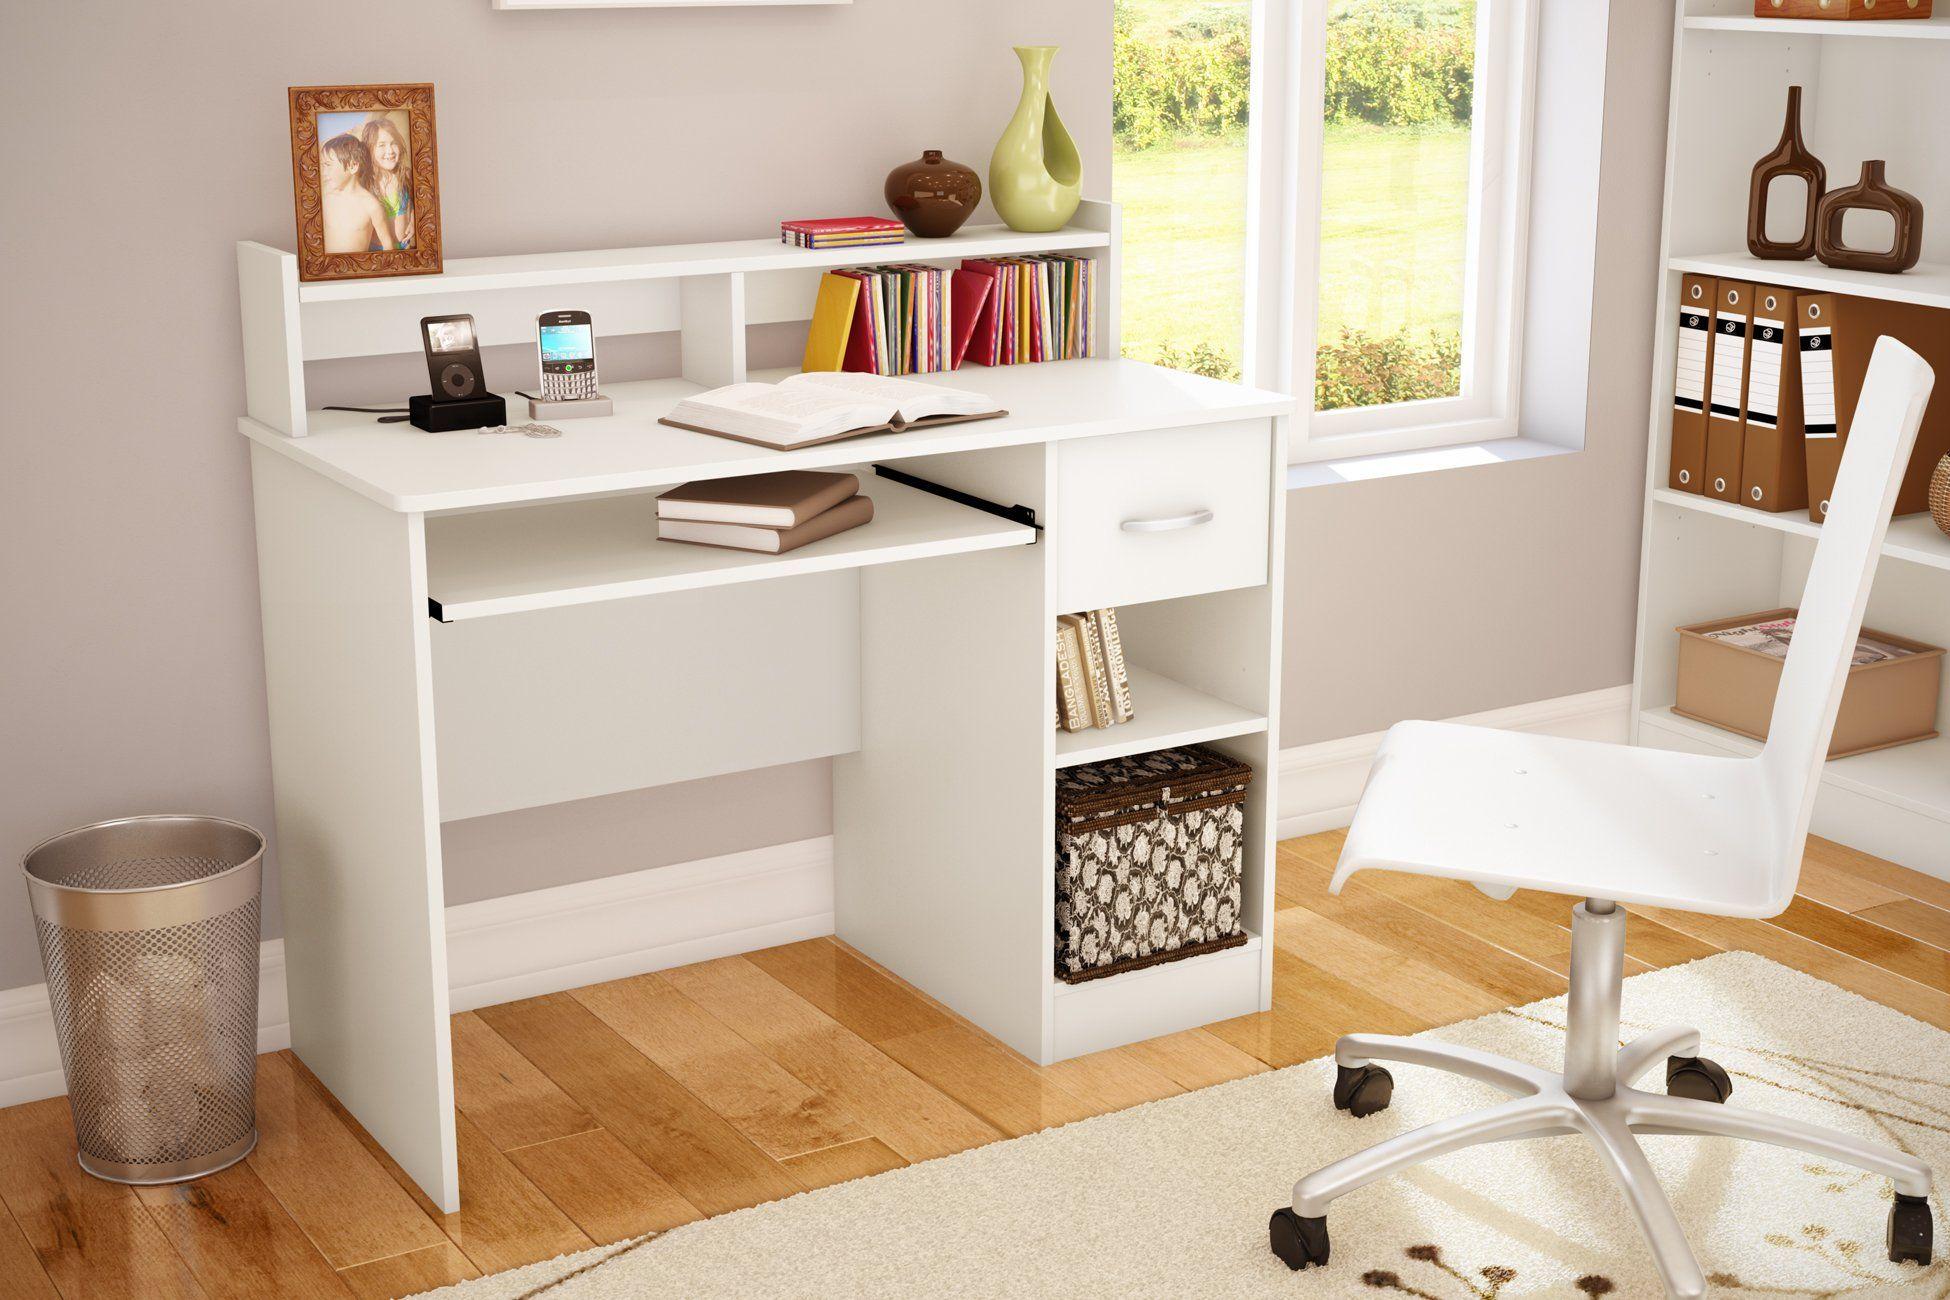 Amazon Com South Shore Axess Collection Desk Pure White Home Office Desks Desk Furniture Modern Computer Desk Home Office Computer Desk